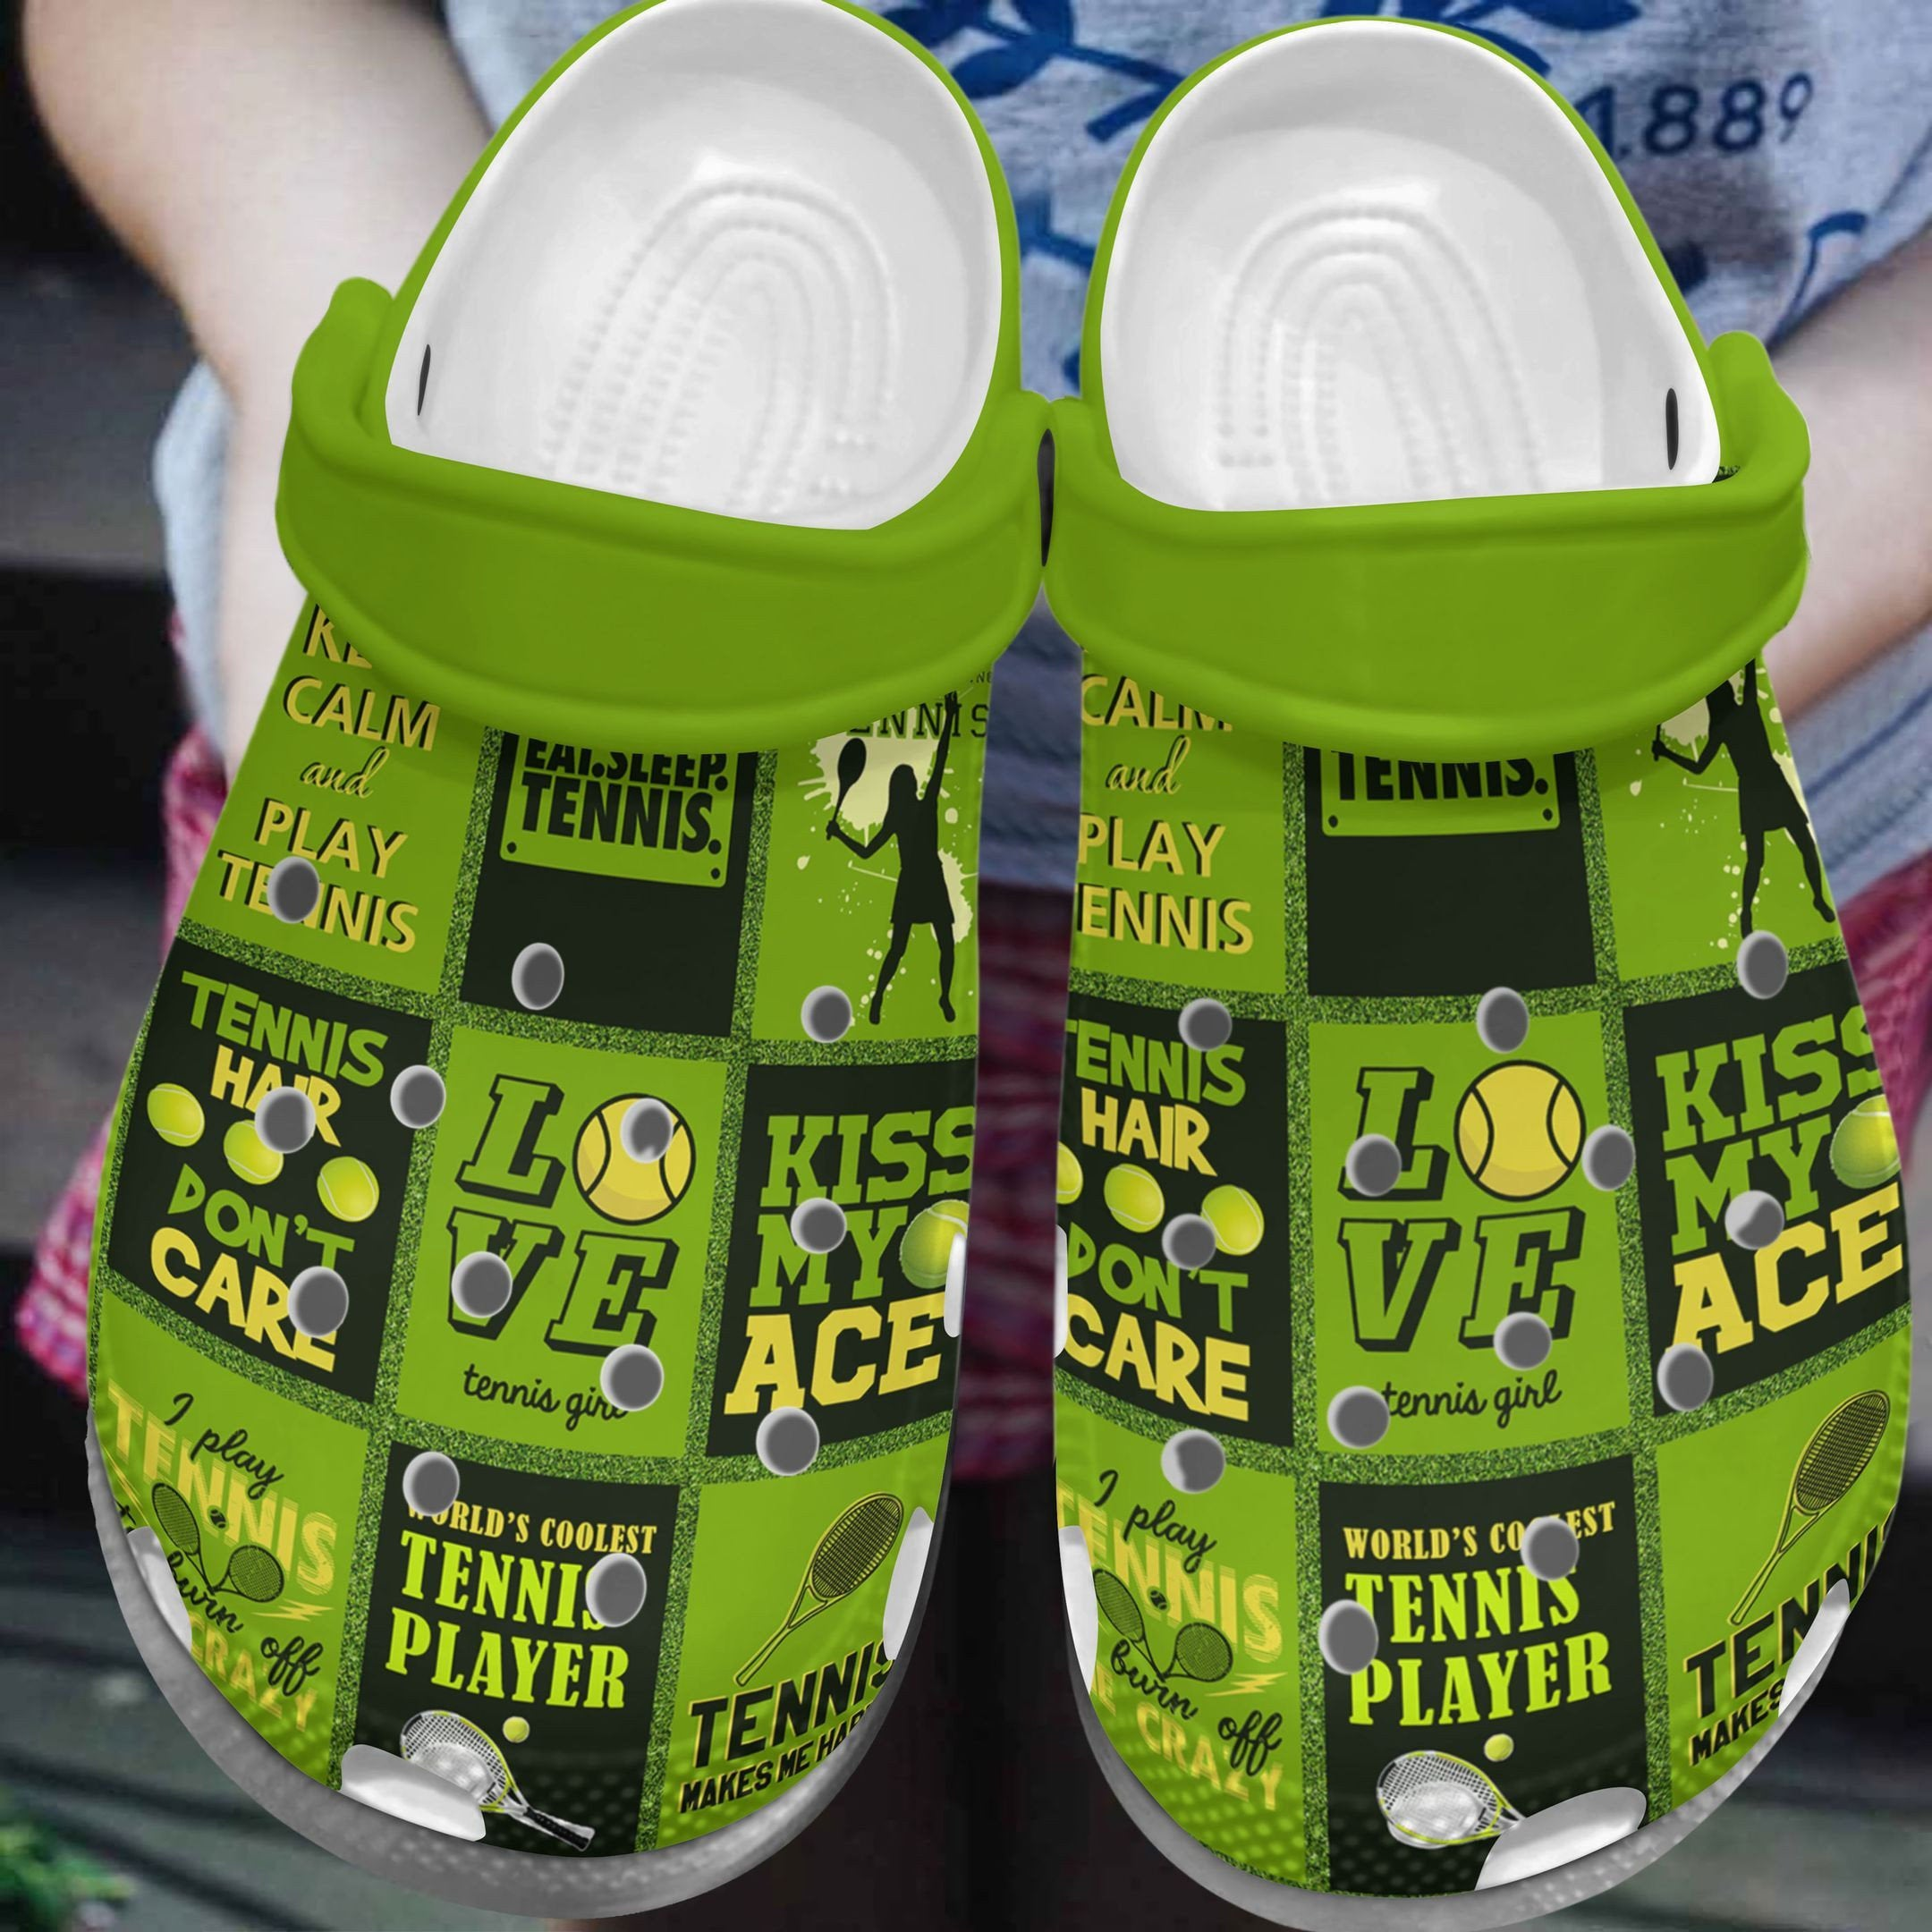 Tennis Kiss My Ace Crocs Clog Shoes